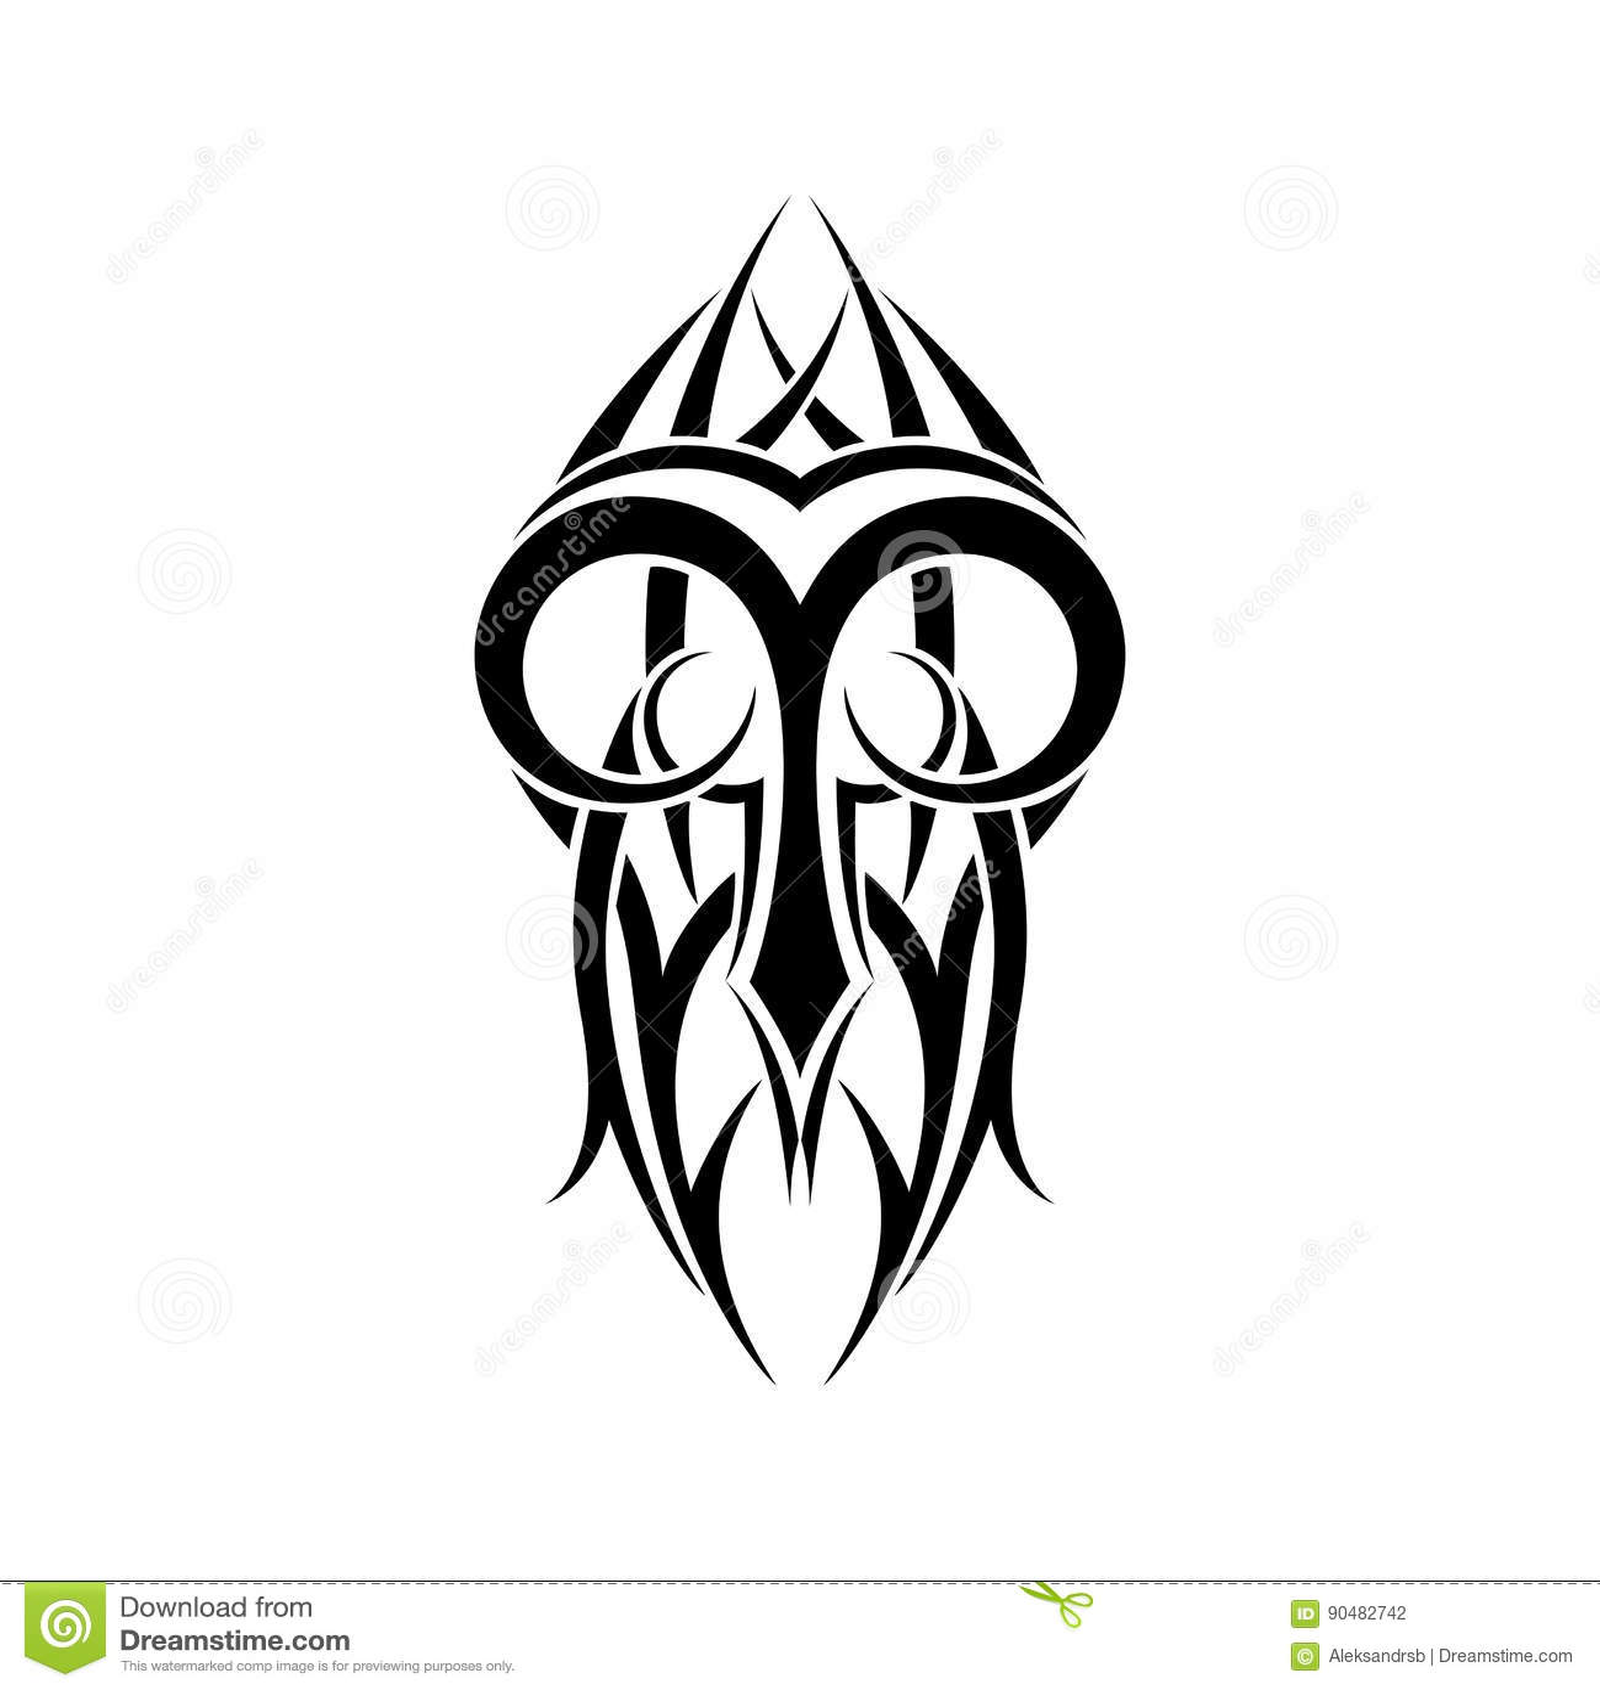 Aries Zodiac Abstract Tribal Tattoo Design Stock Vector